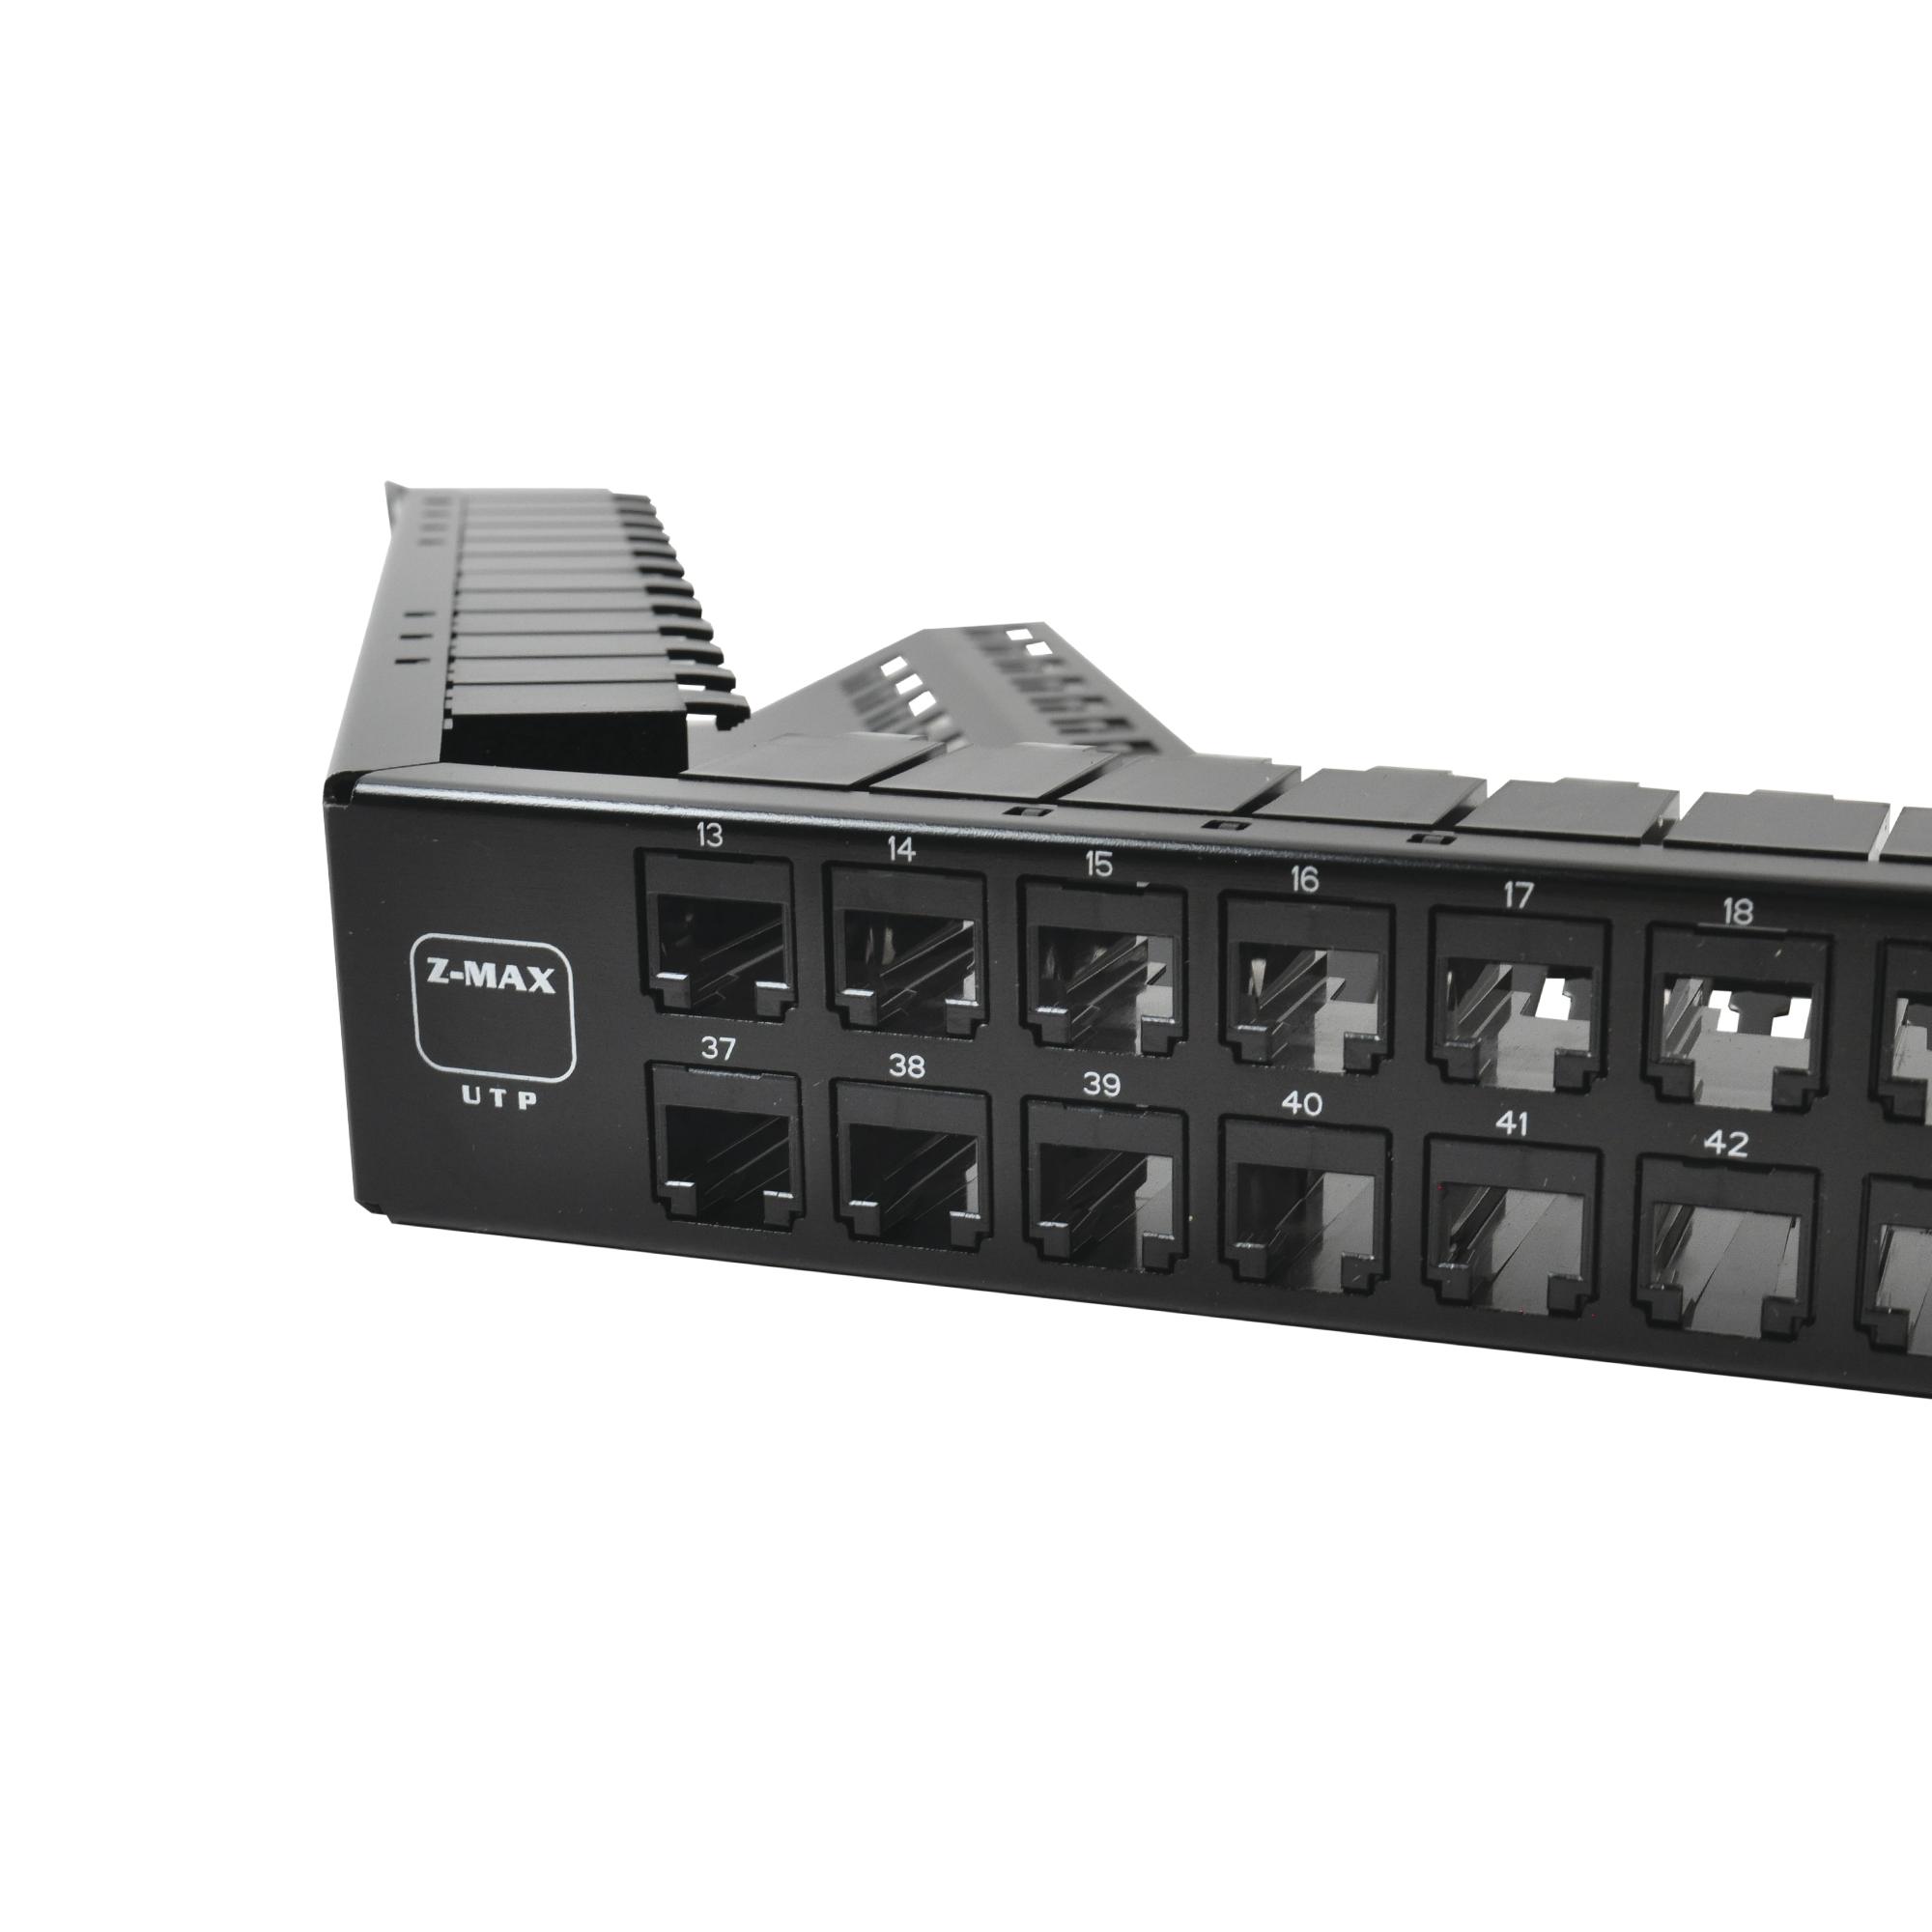 Patch Panel UTP Z-MAX Categoría 6A, de 48 puertos, Angulado, 1UR